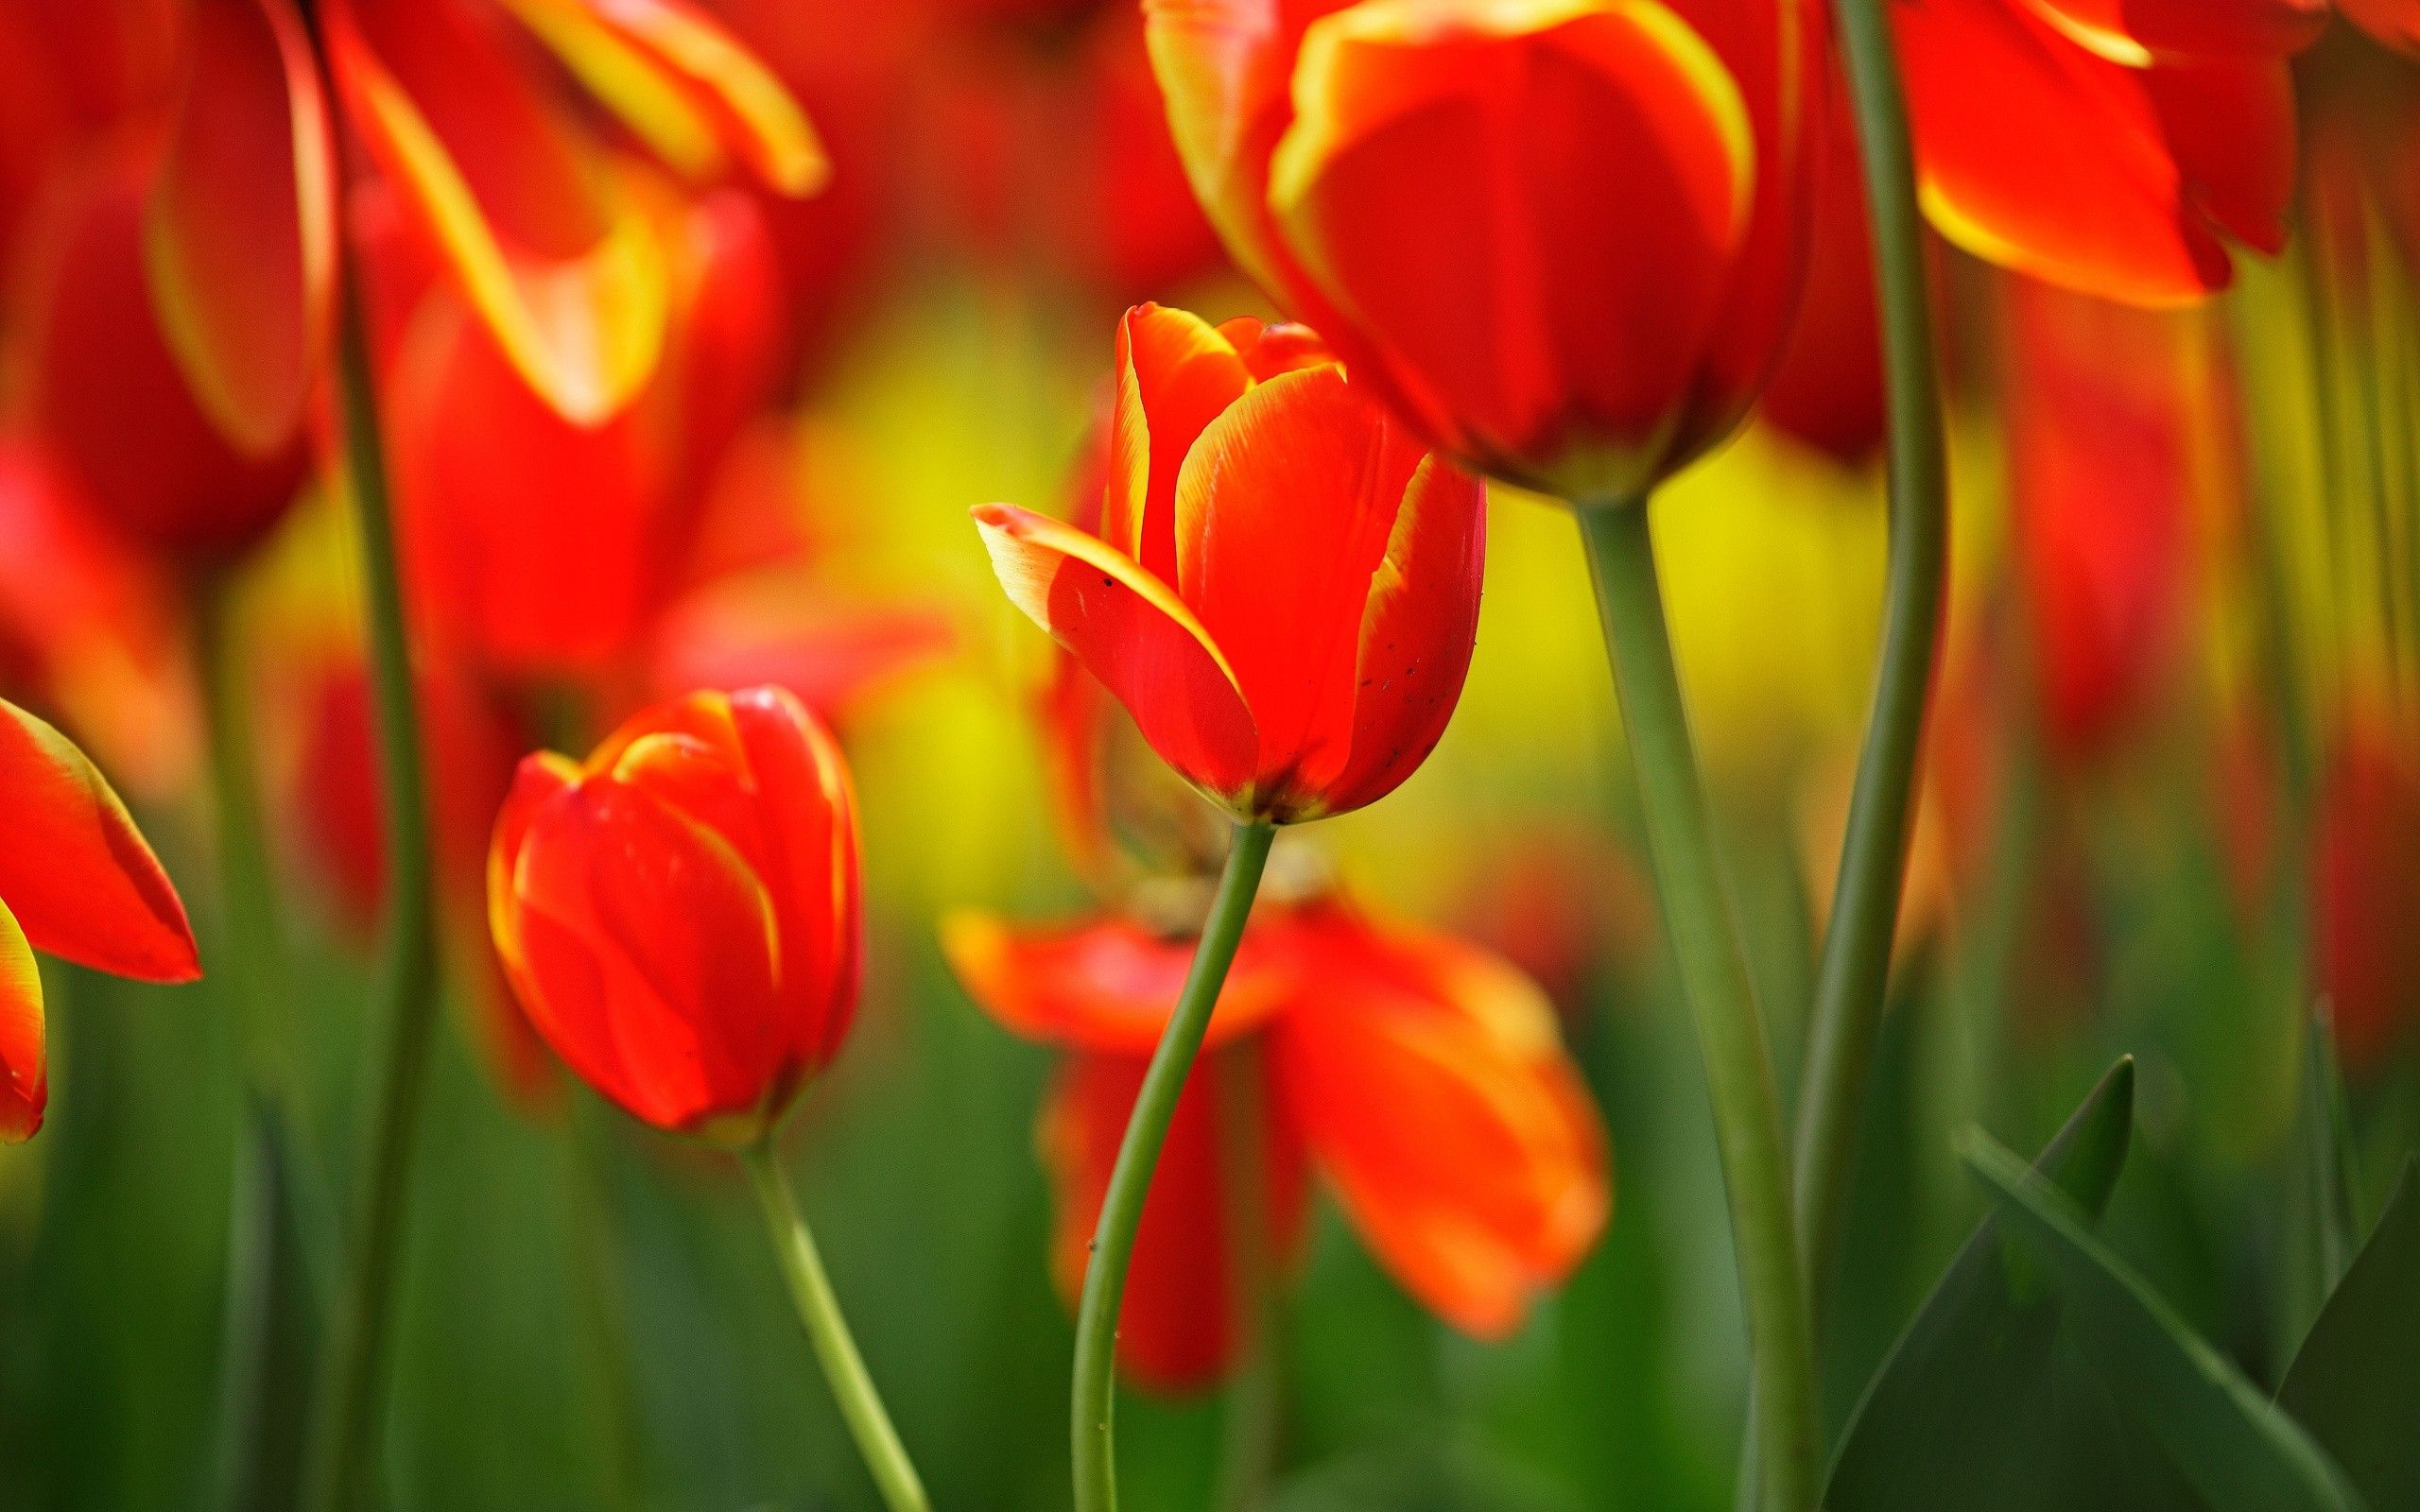 Red Orange Tulips Hd Desktop Wallpaper Hd Desktop Wallpaper Beautiful Flowers Wallpapers Orange Tulips Tulips